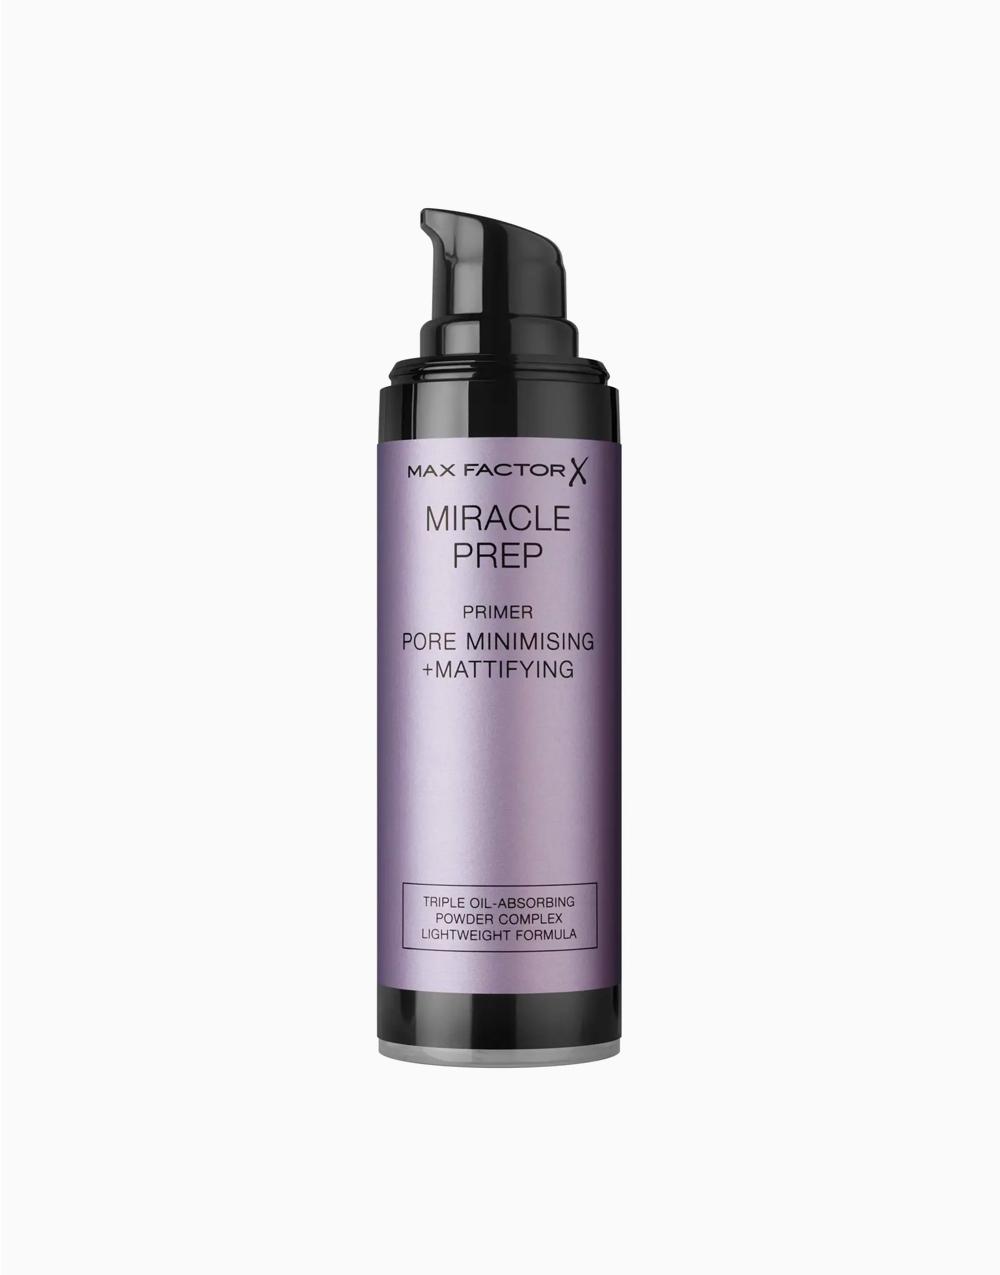 Miracle Prep Pore Minimising & Mattifying Primer by Max Factor